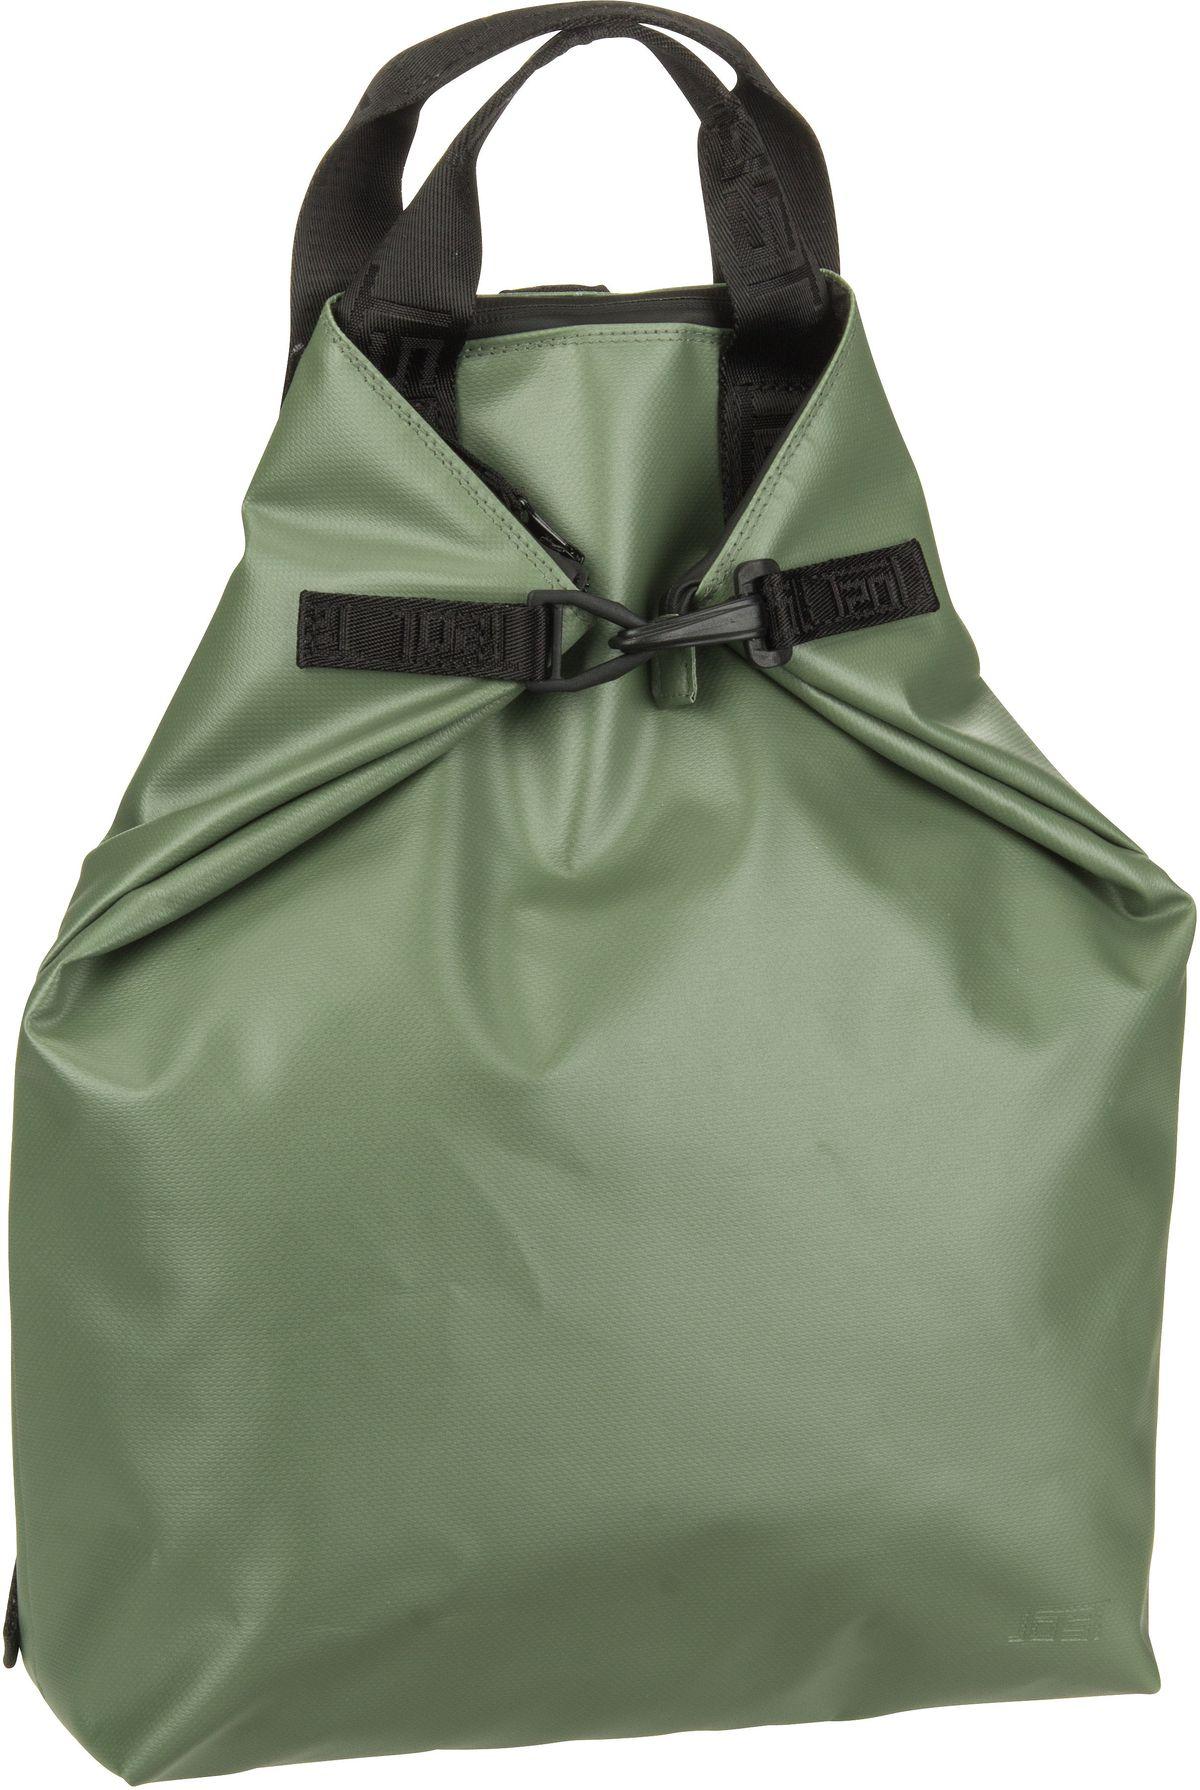 Rucksack / Daypack Tolja 4771 X-Change Bag S Olive